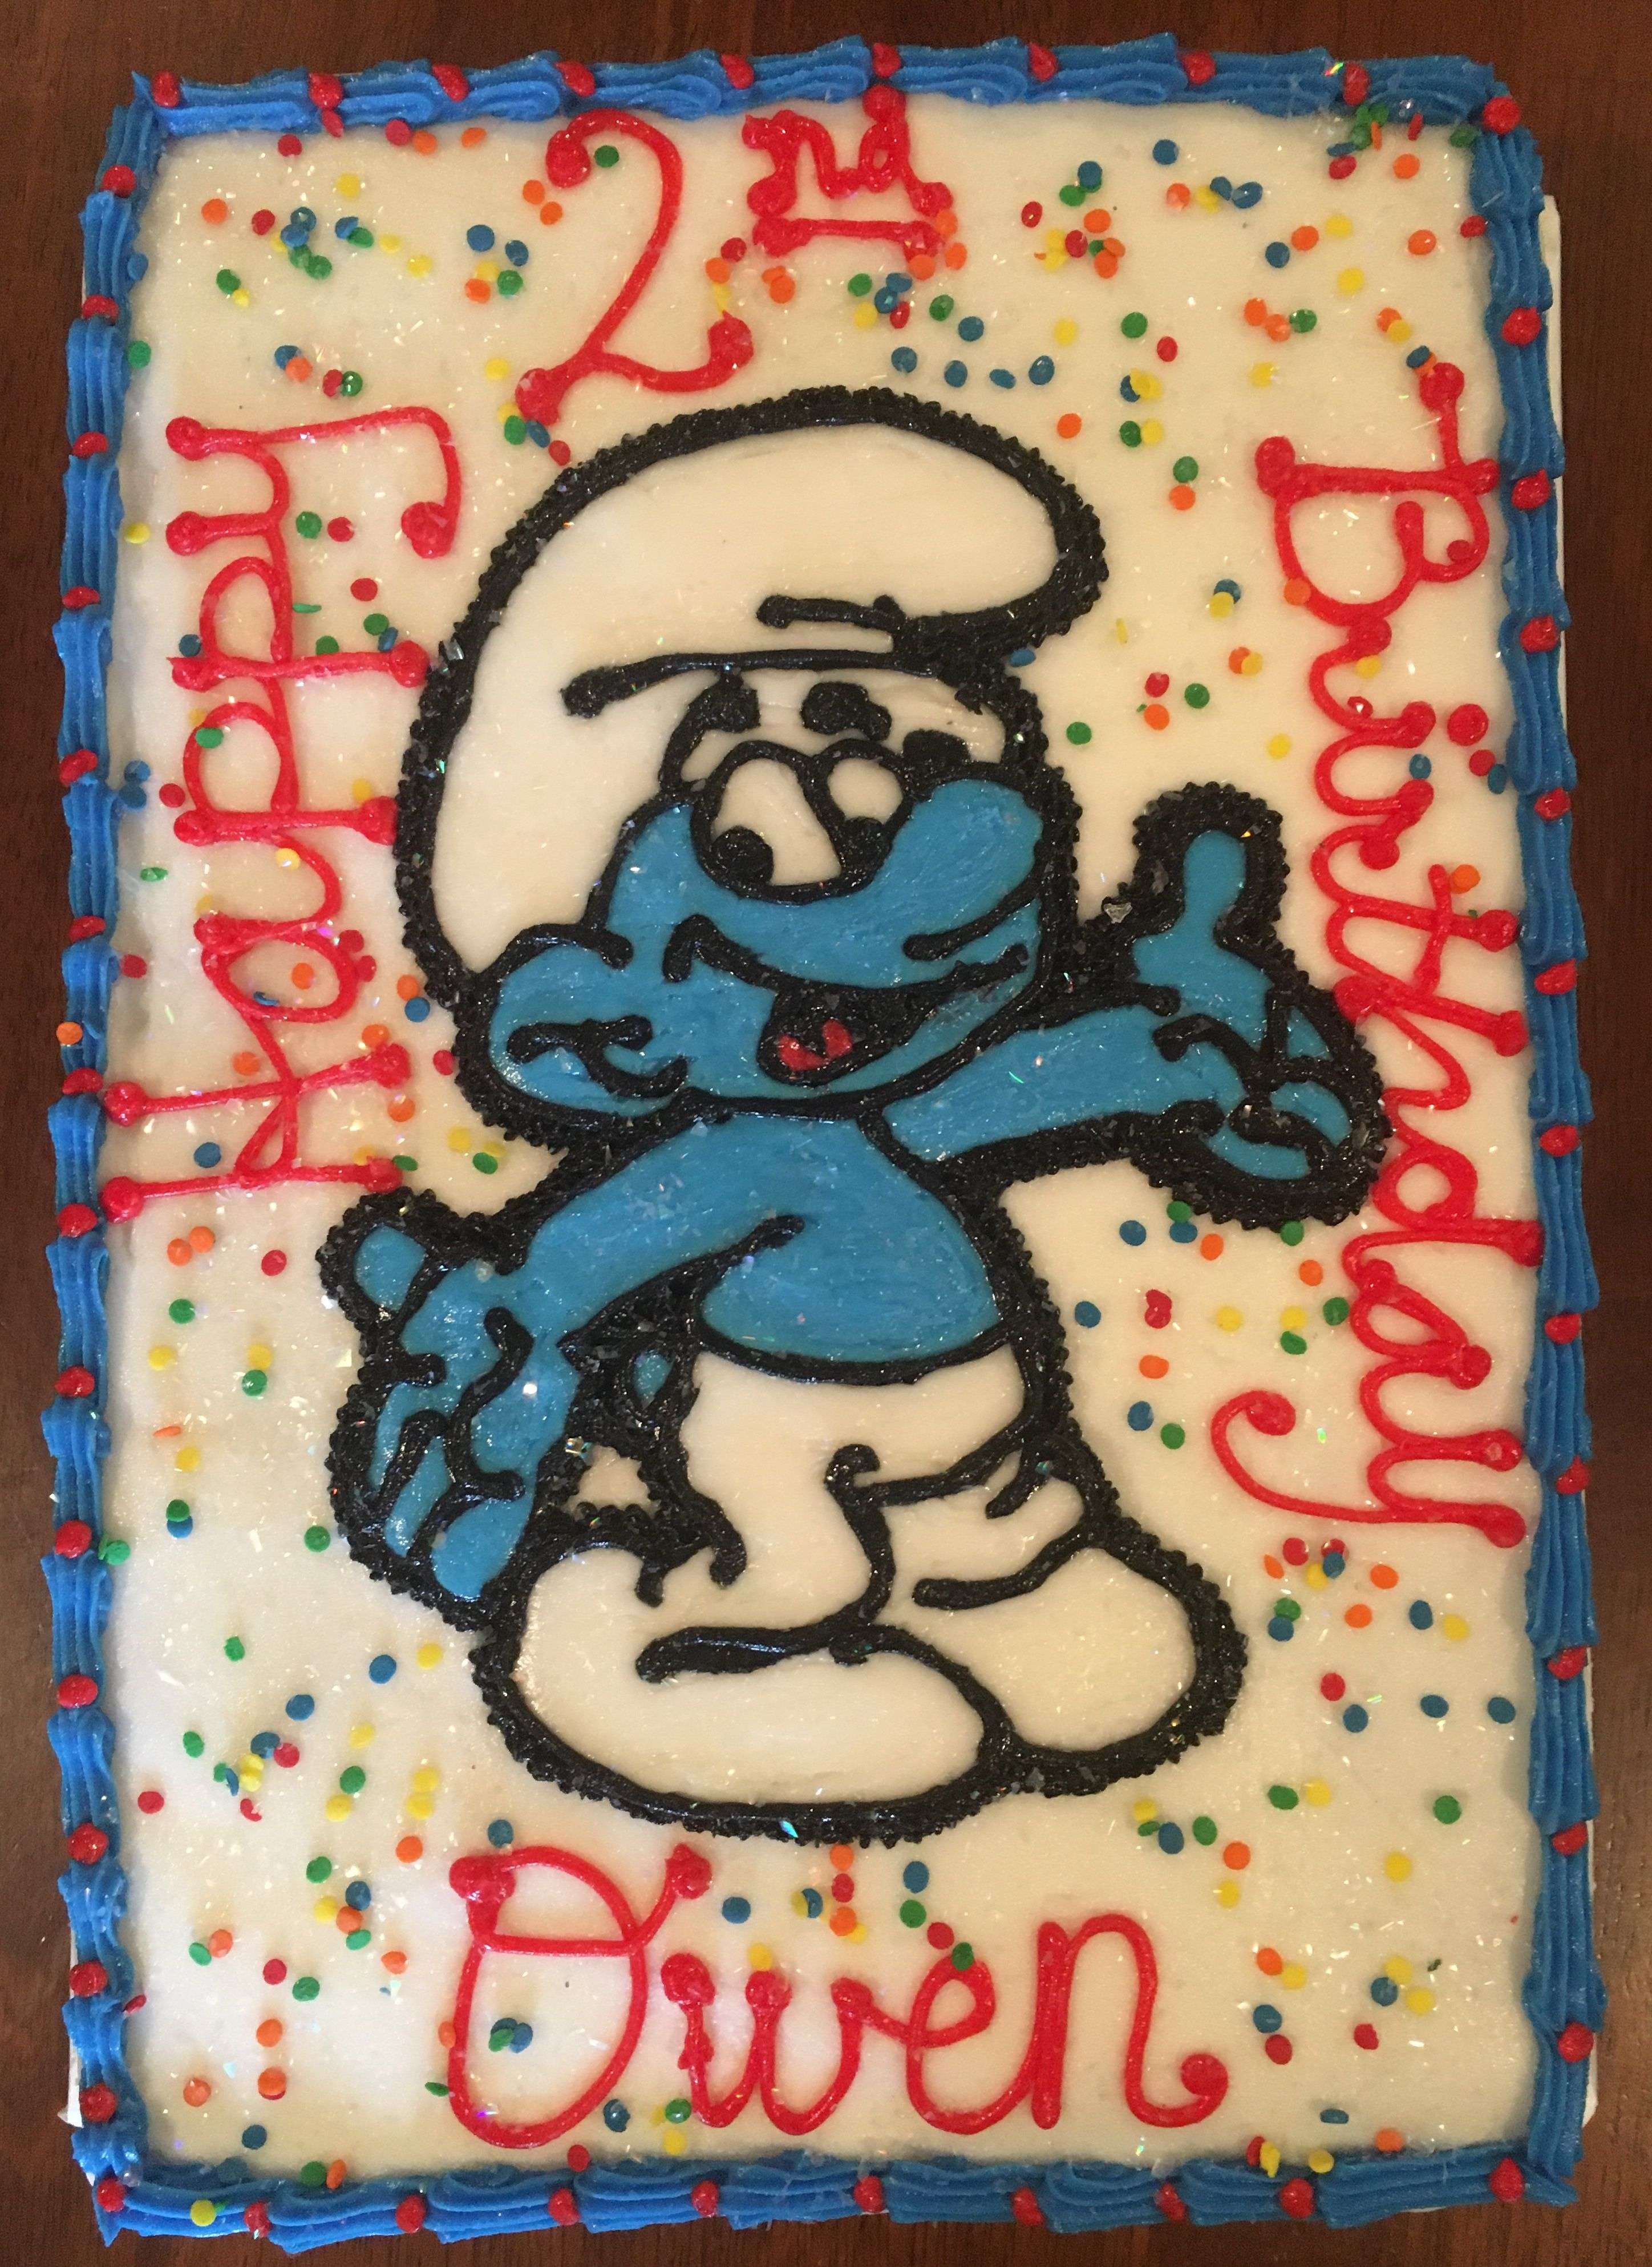 Boy Smurf Birthday Cake Homemade cakes, Cake designs